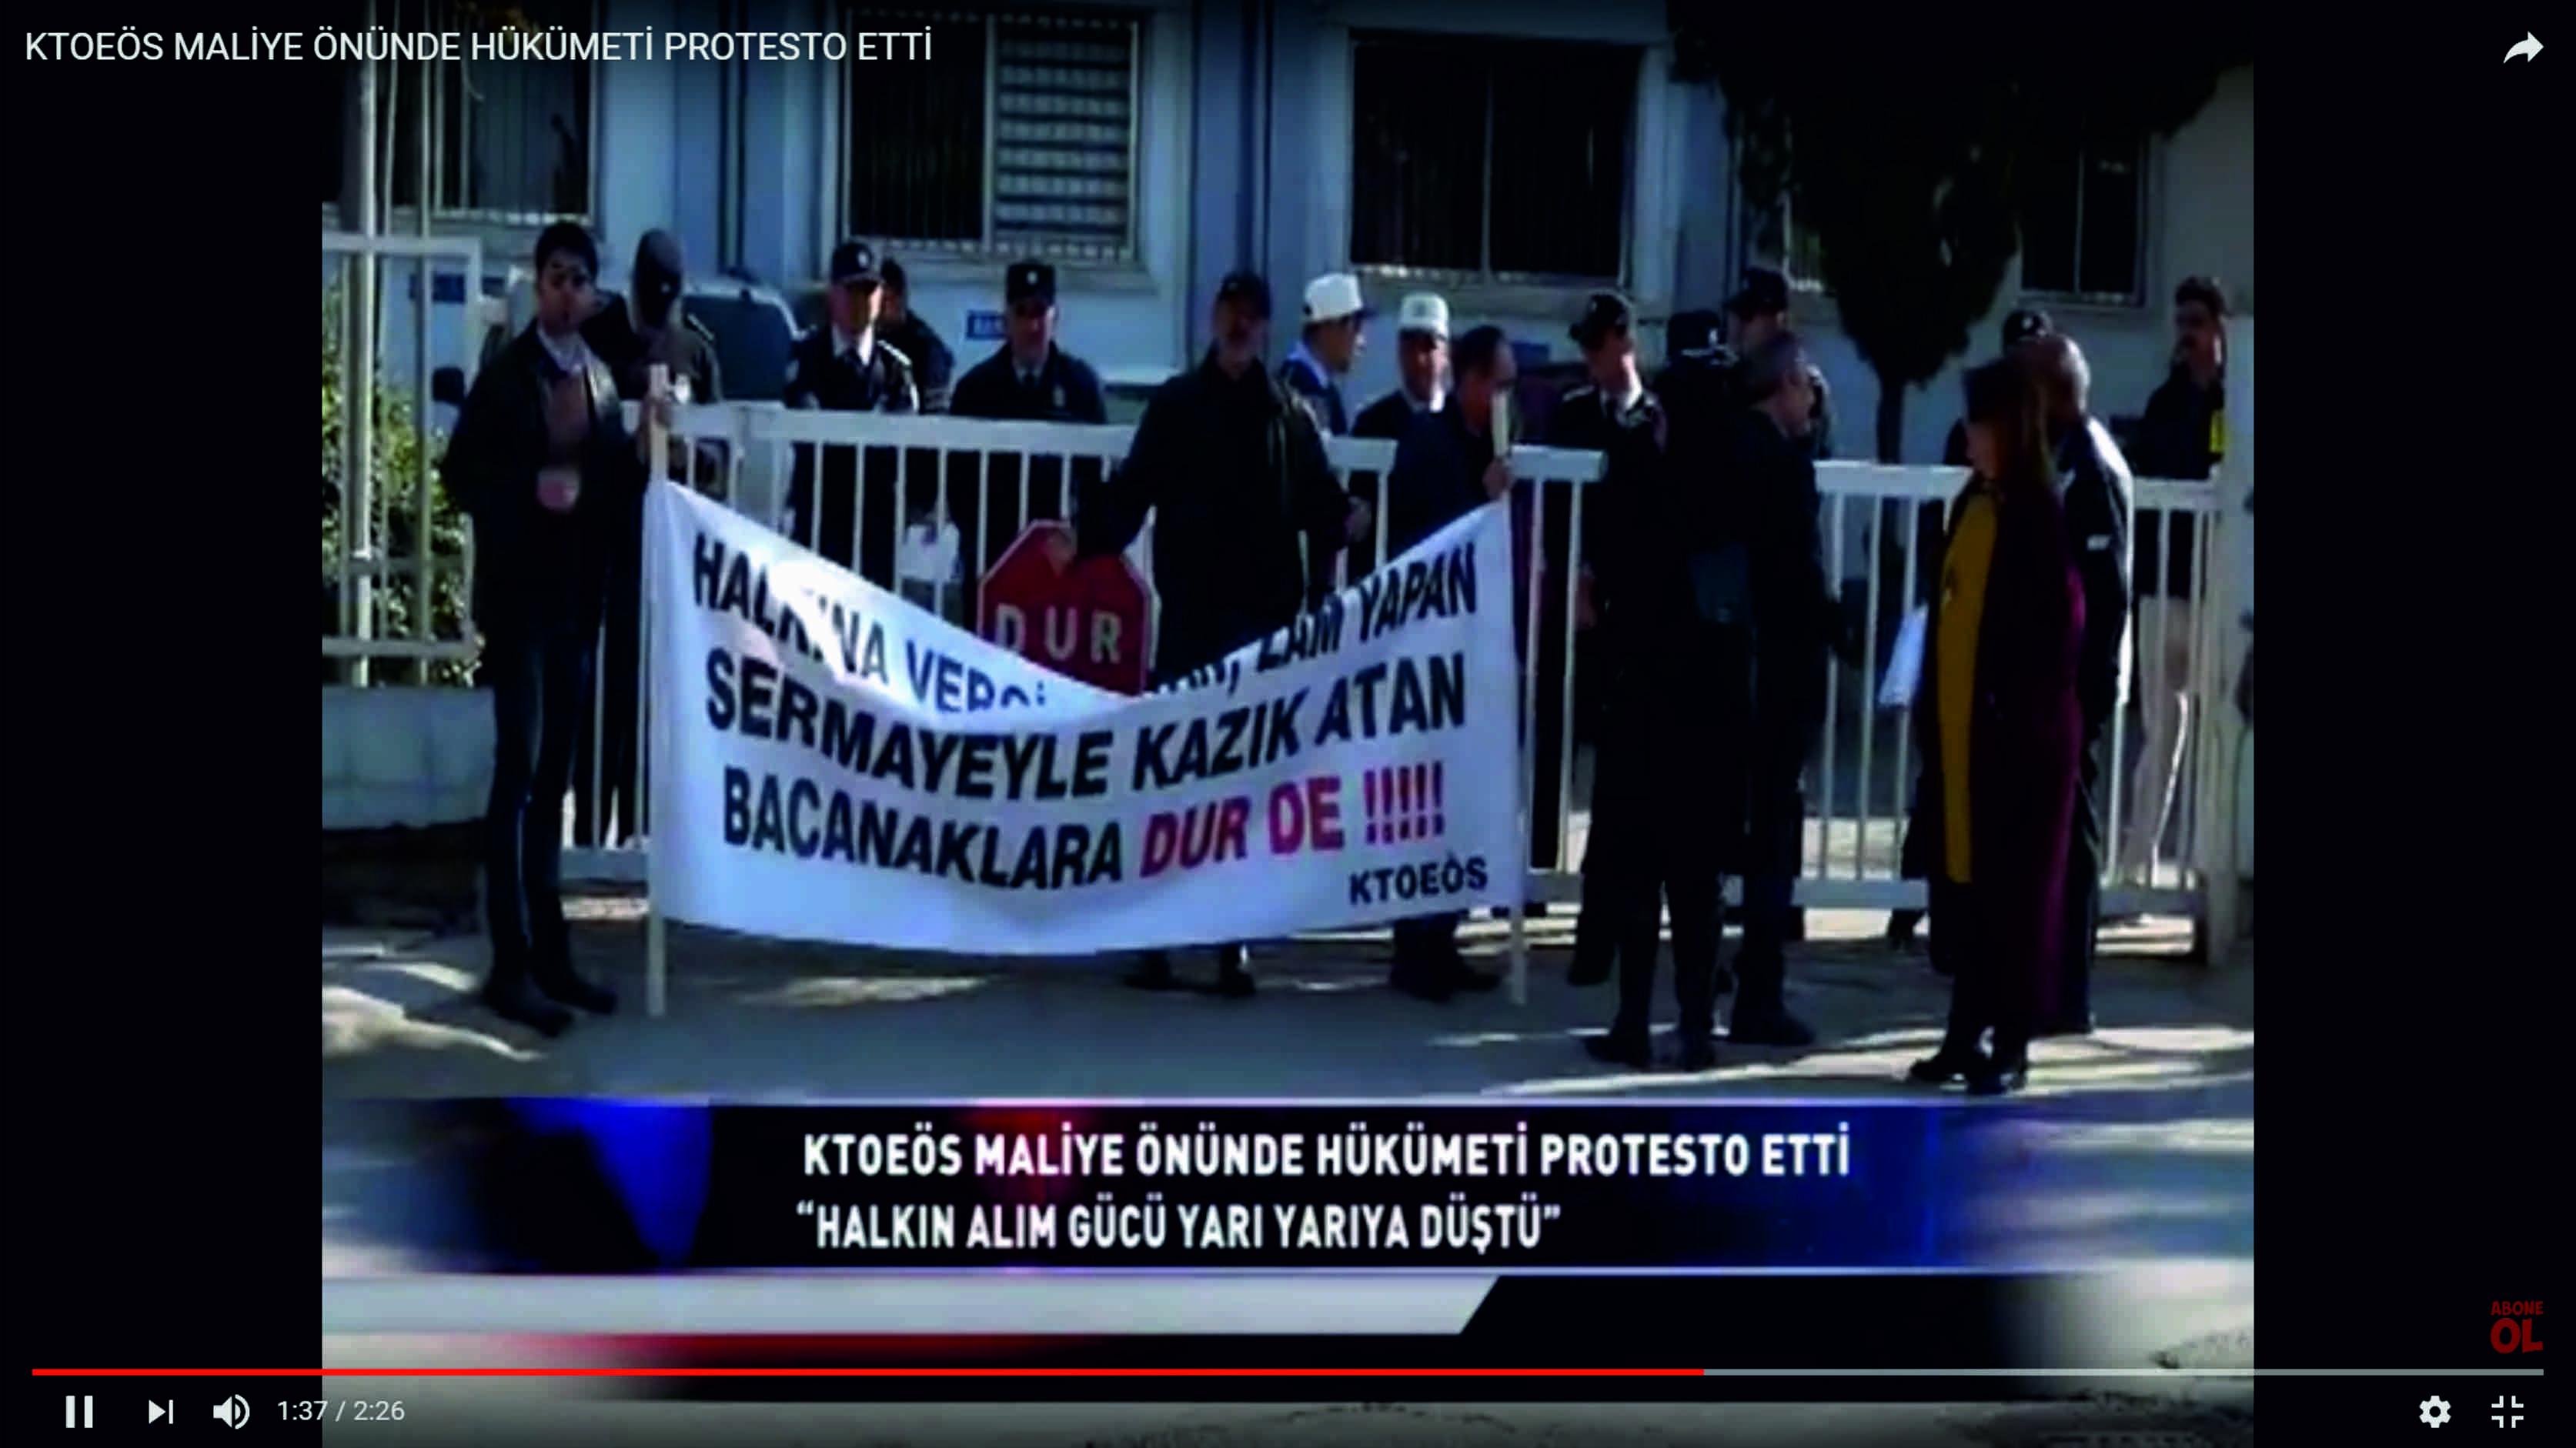 maliye bakanı protesto